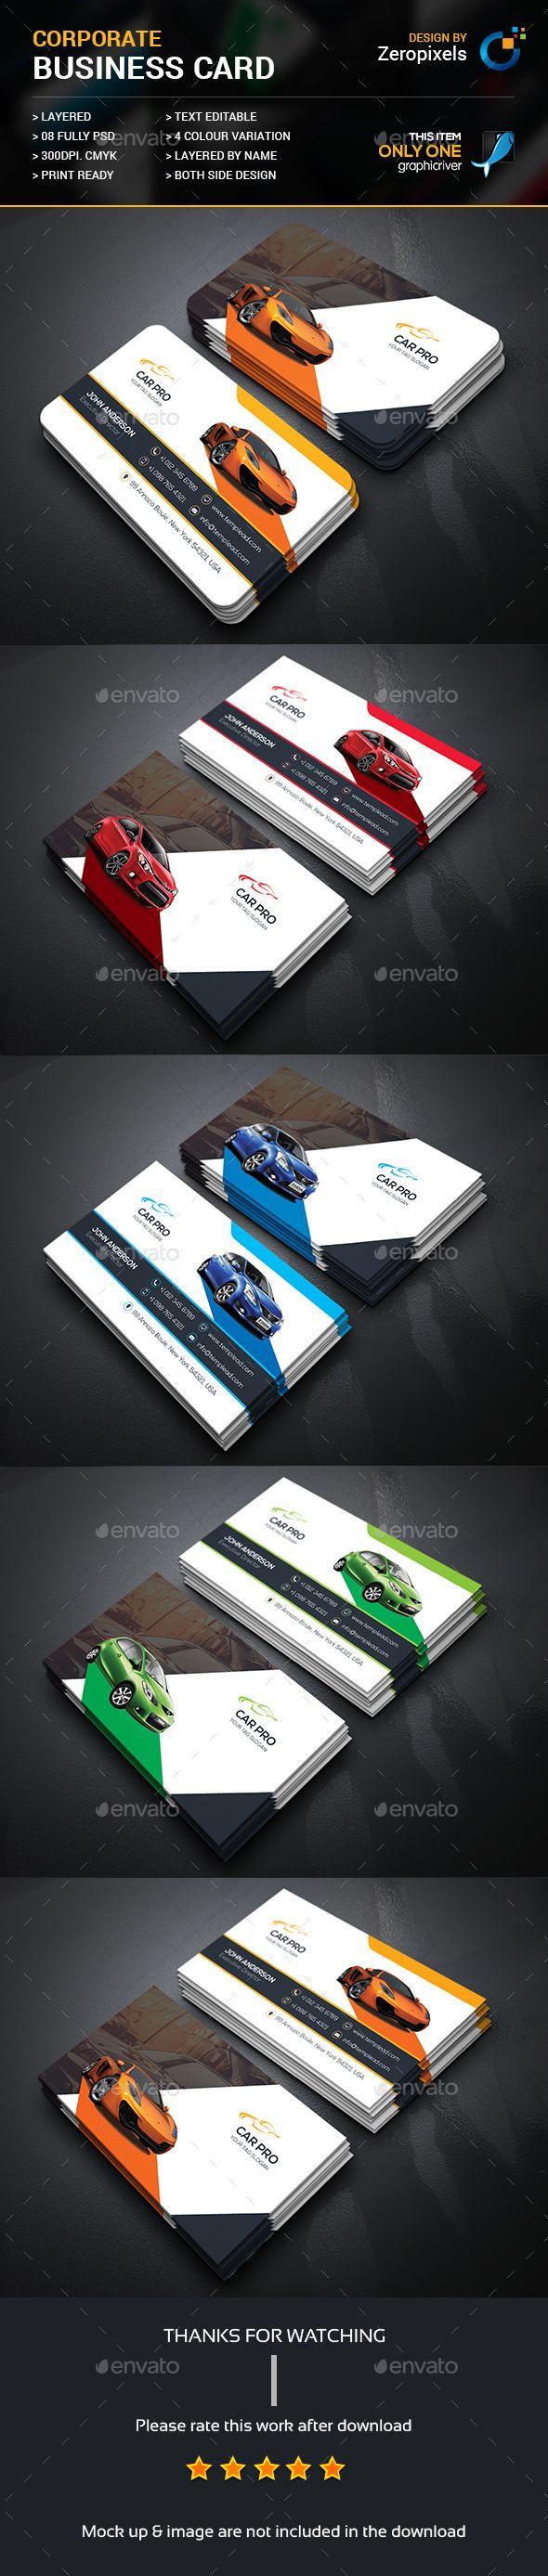 Rent car business card business cards print templates download rent car business card business cards print templates download here httpsgraphicriveritemrent car business card 17298440refclassicdesignp colourmoves